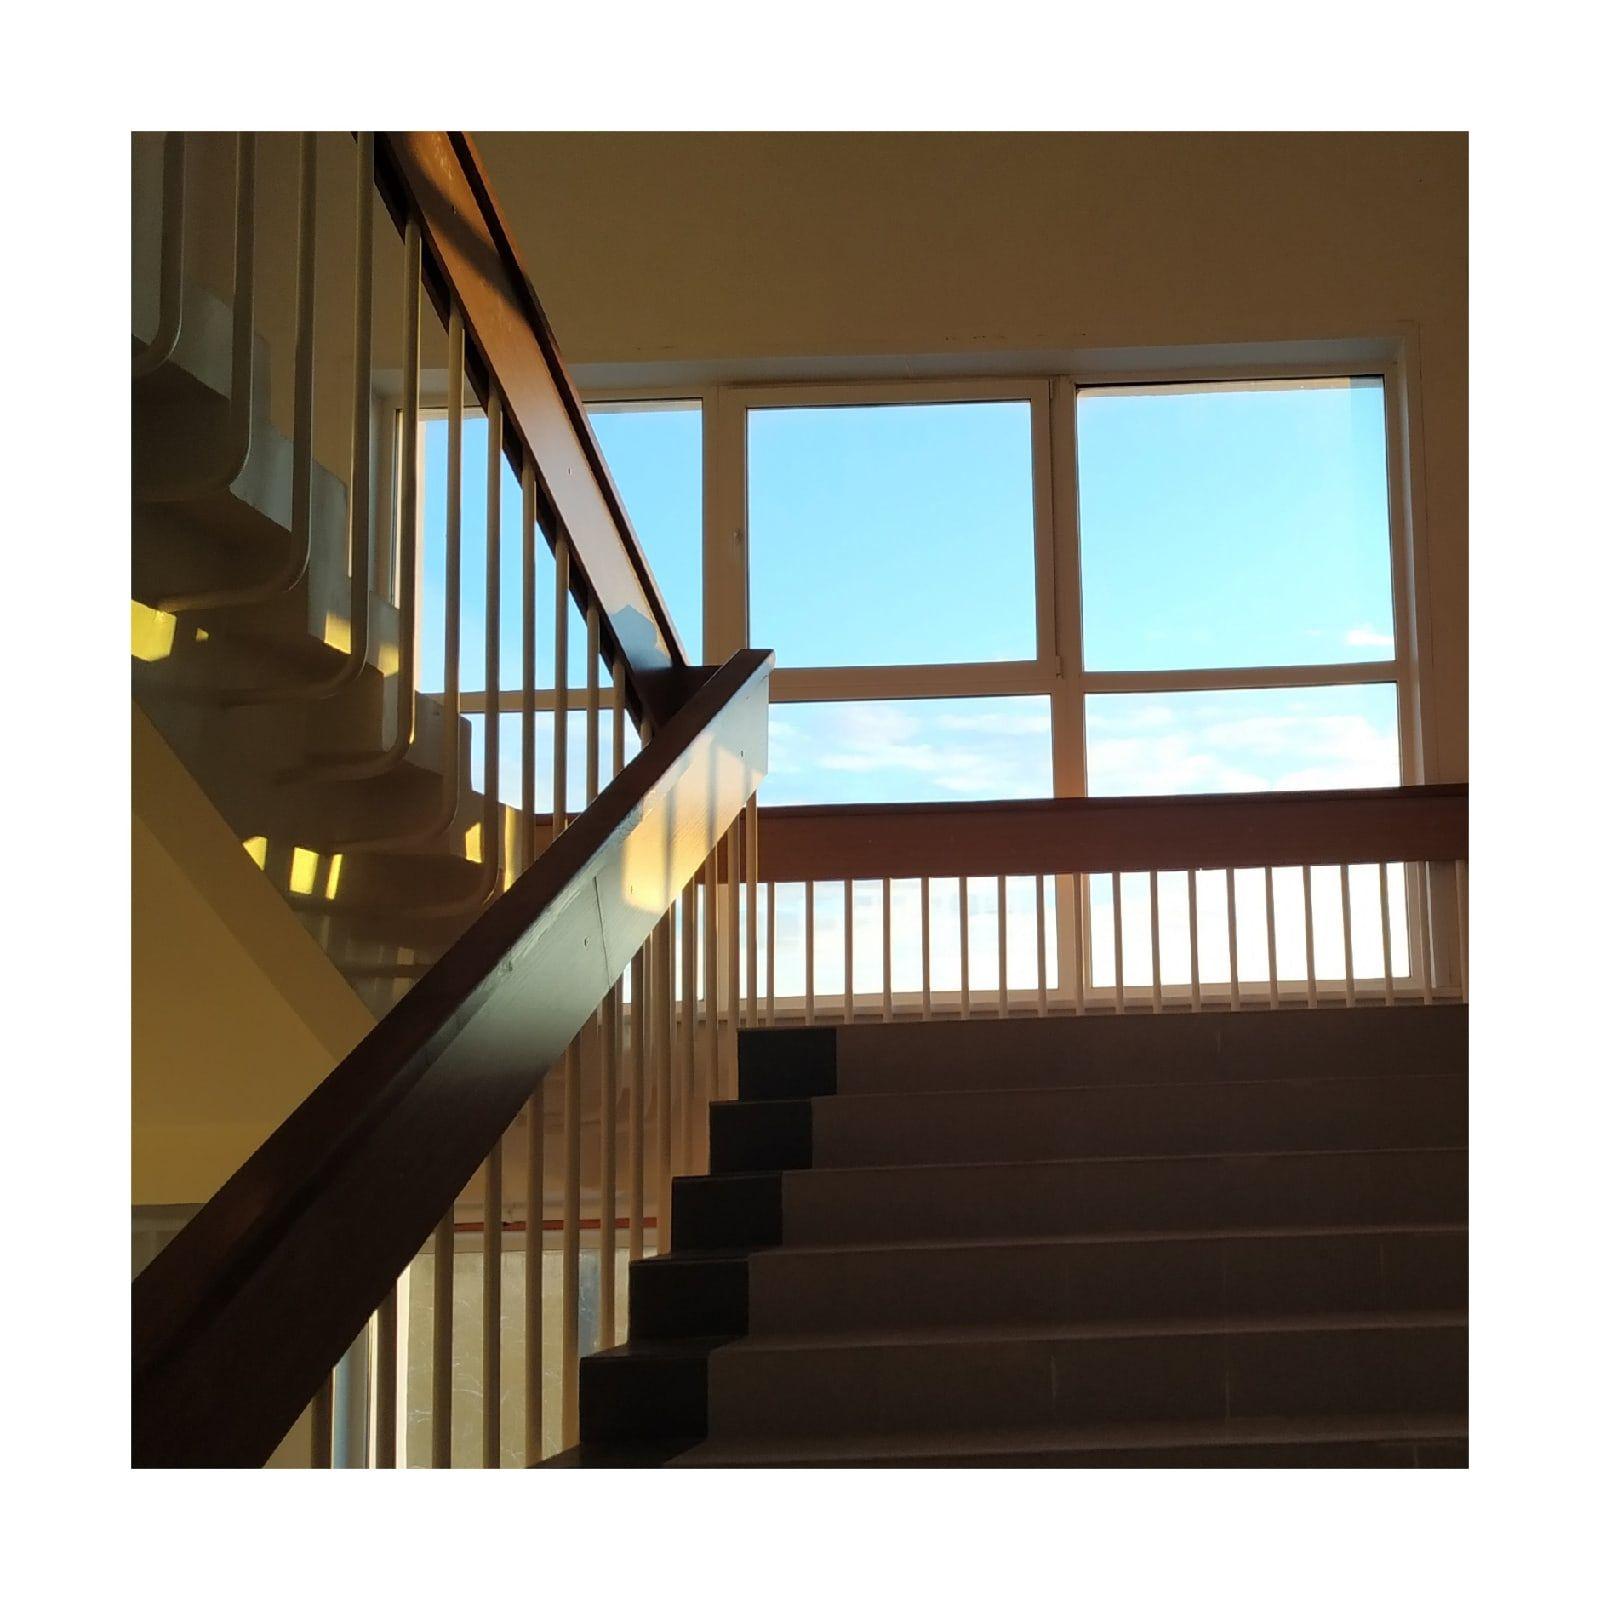 univer лестница небо перила окно